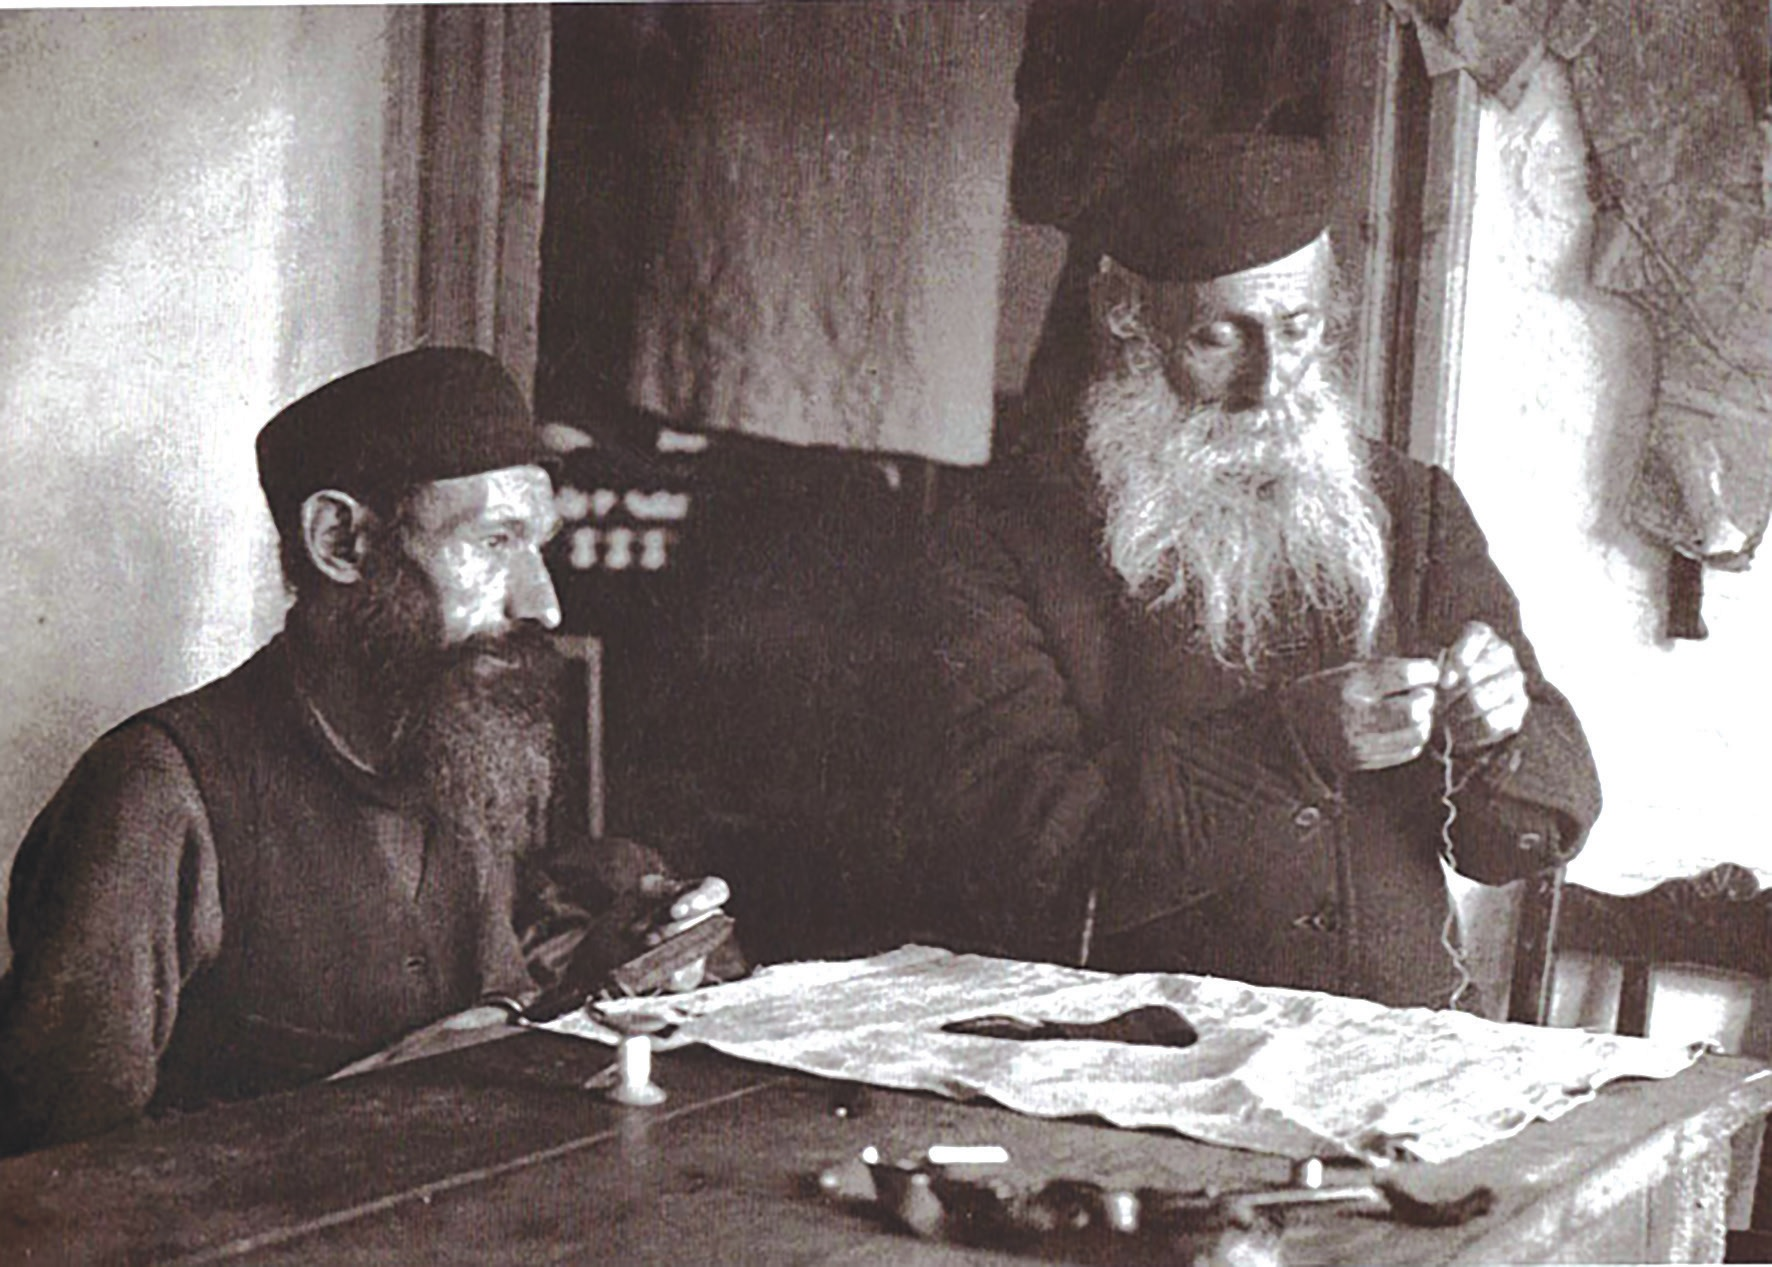 Žydų siuvėjas. 1926 m. Fot. Alter Sholem Kacyzne, YIVO instituto fondas